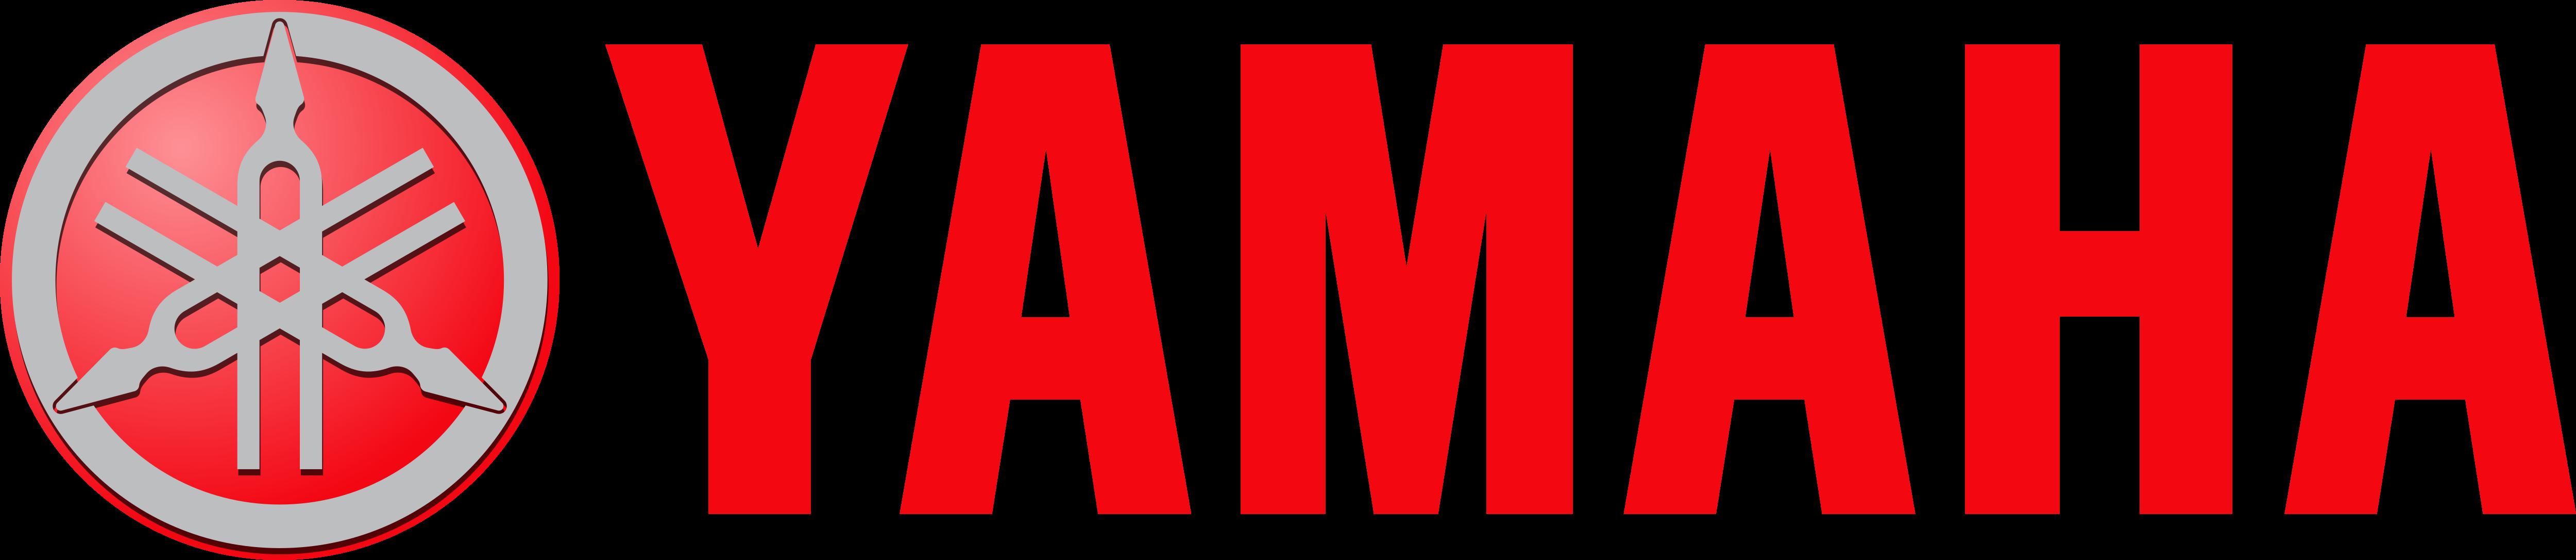 Yamaha Motor Company Logos Download